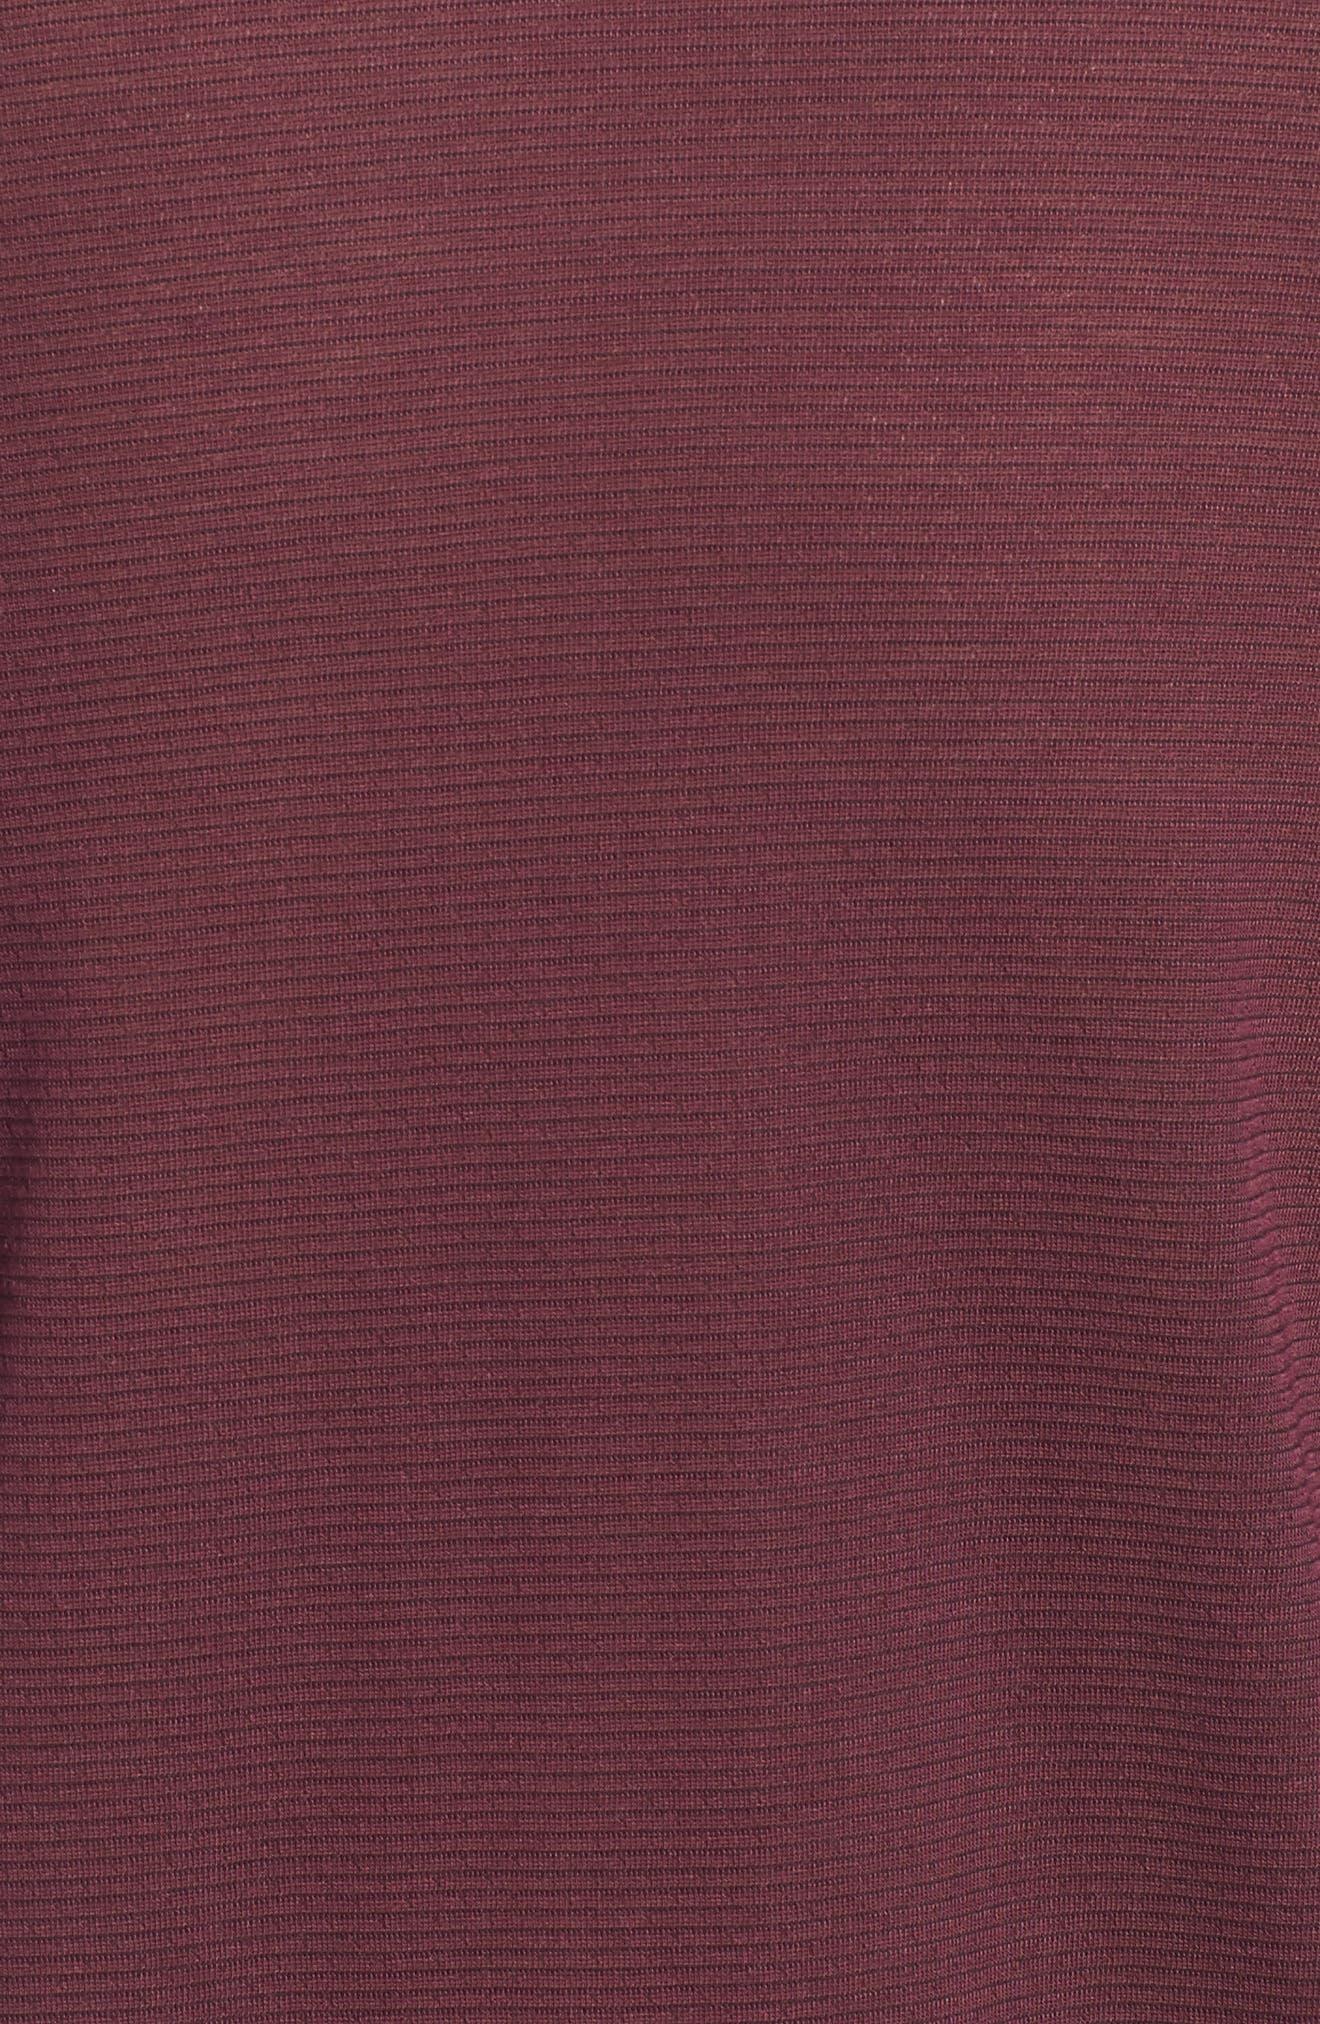 Alternate Image 5  - Under Armour Threadborne Mesh Running T-Shirt